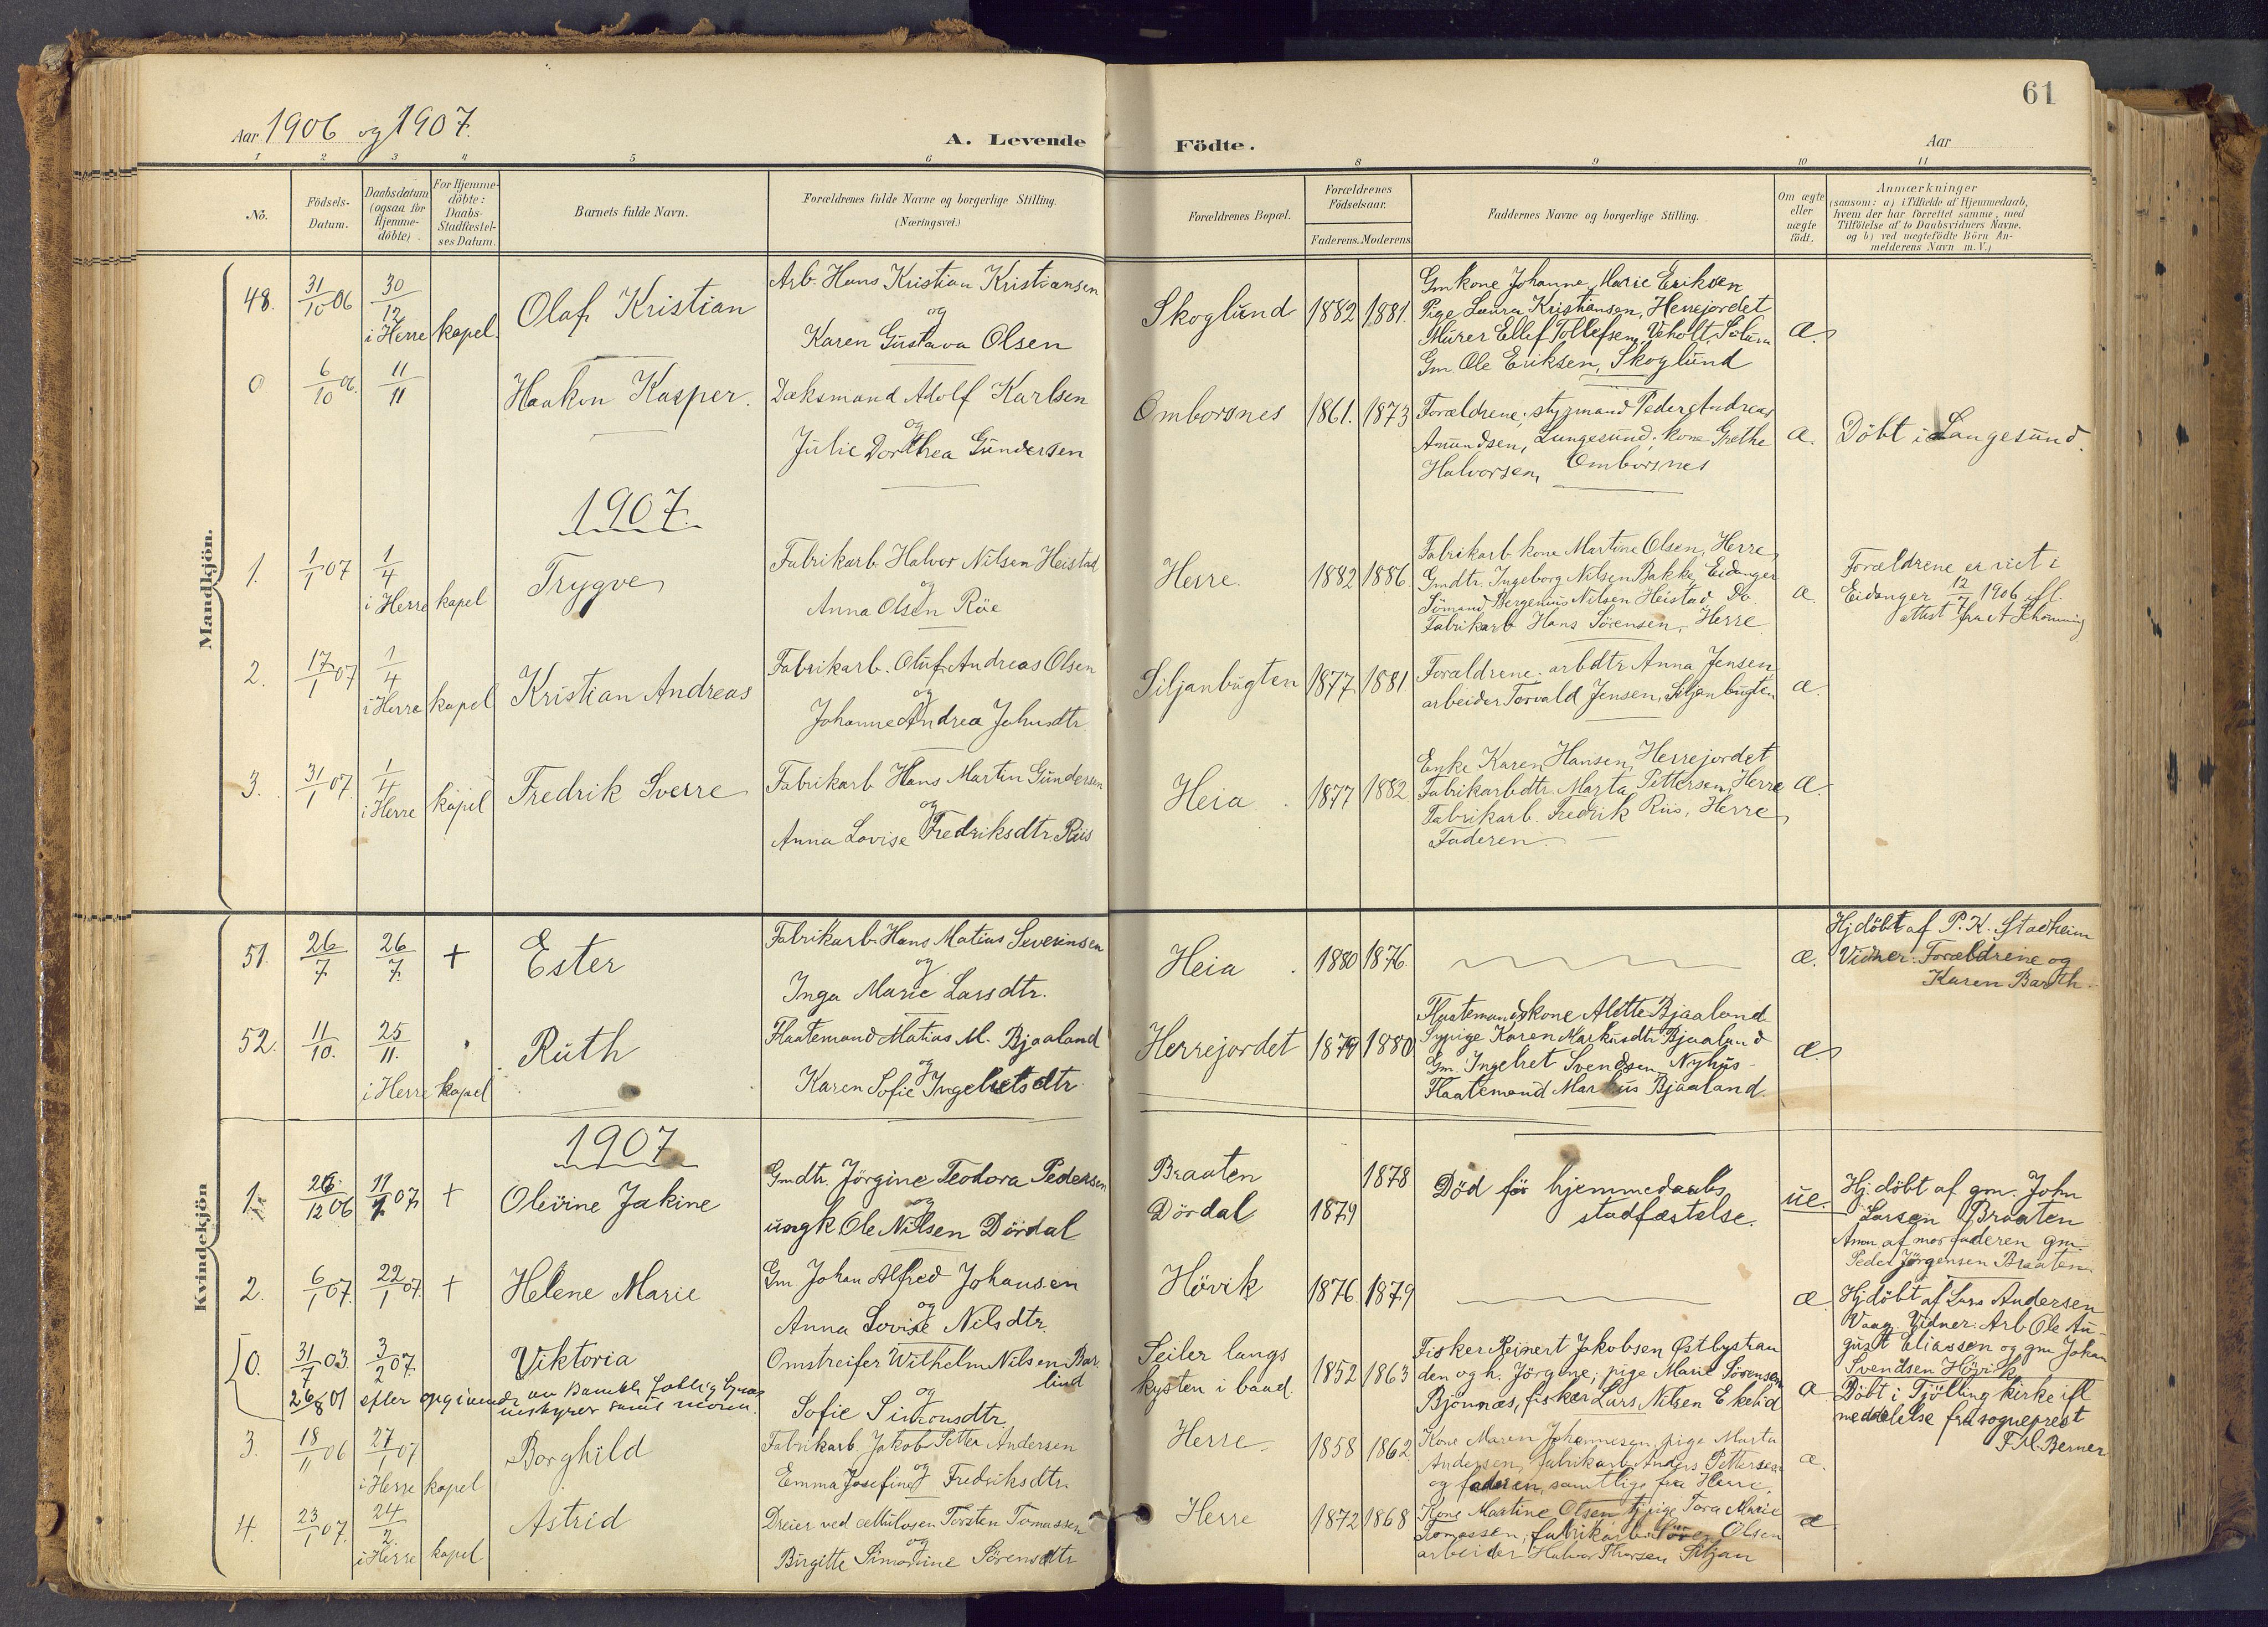 SAKO, Bamble kirkebøker, F/Fa/L0009: Ministerialbok nr. I 9, 1901-1917, s. 61